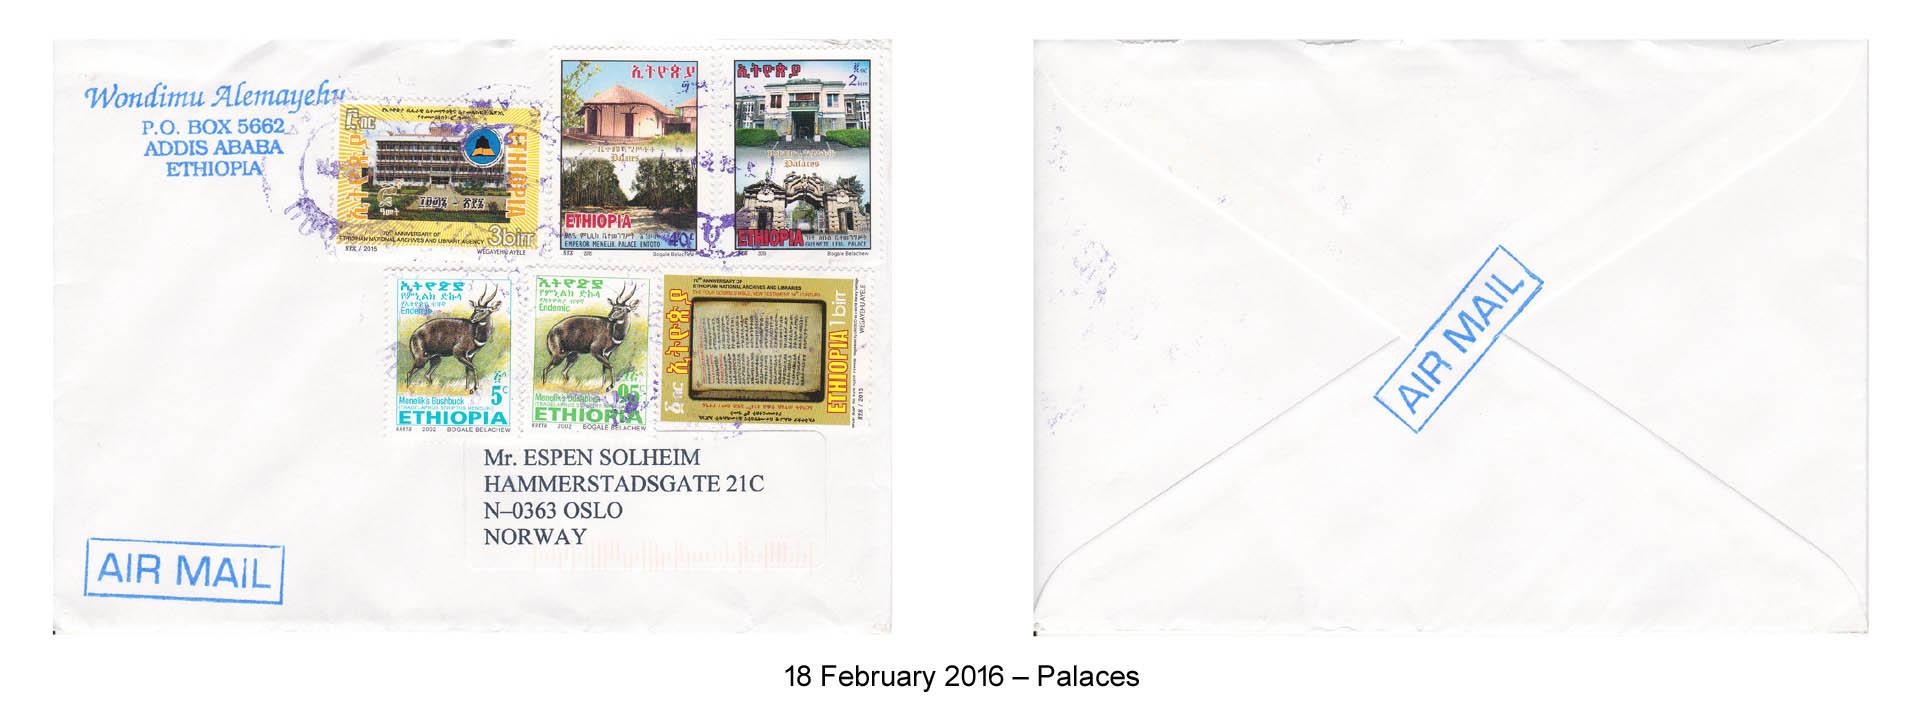 20160218 – Palaces